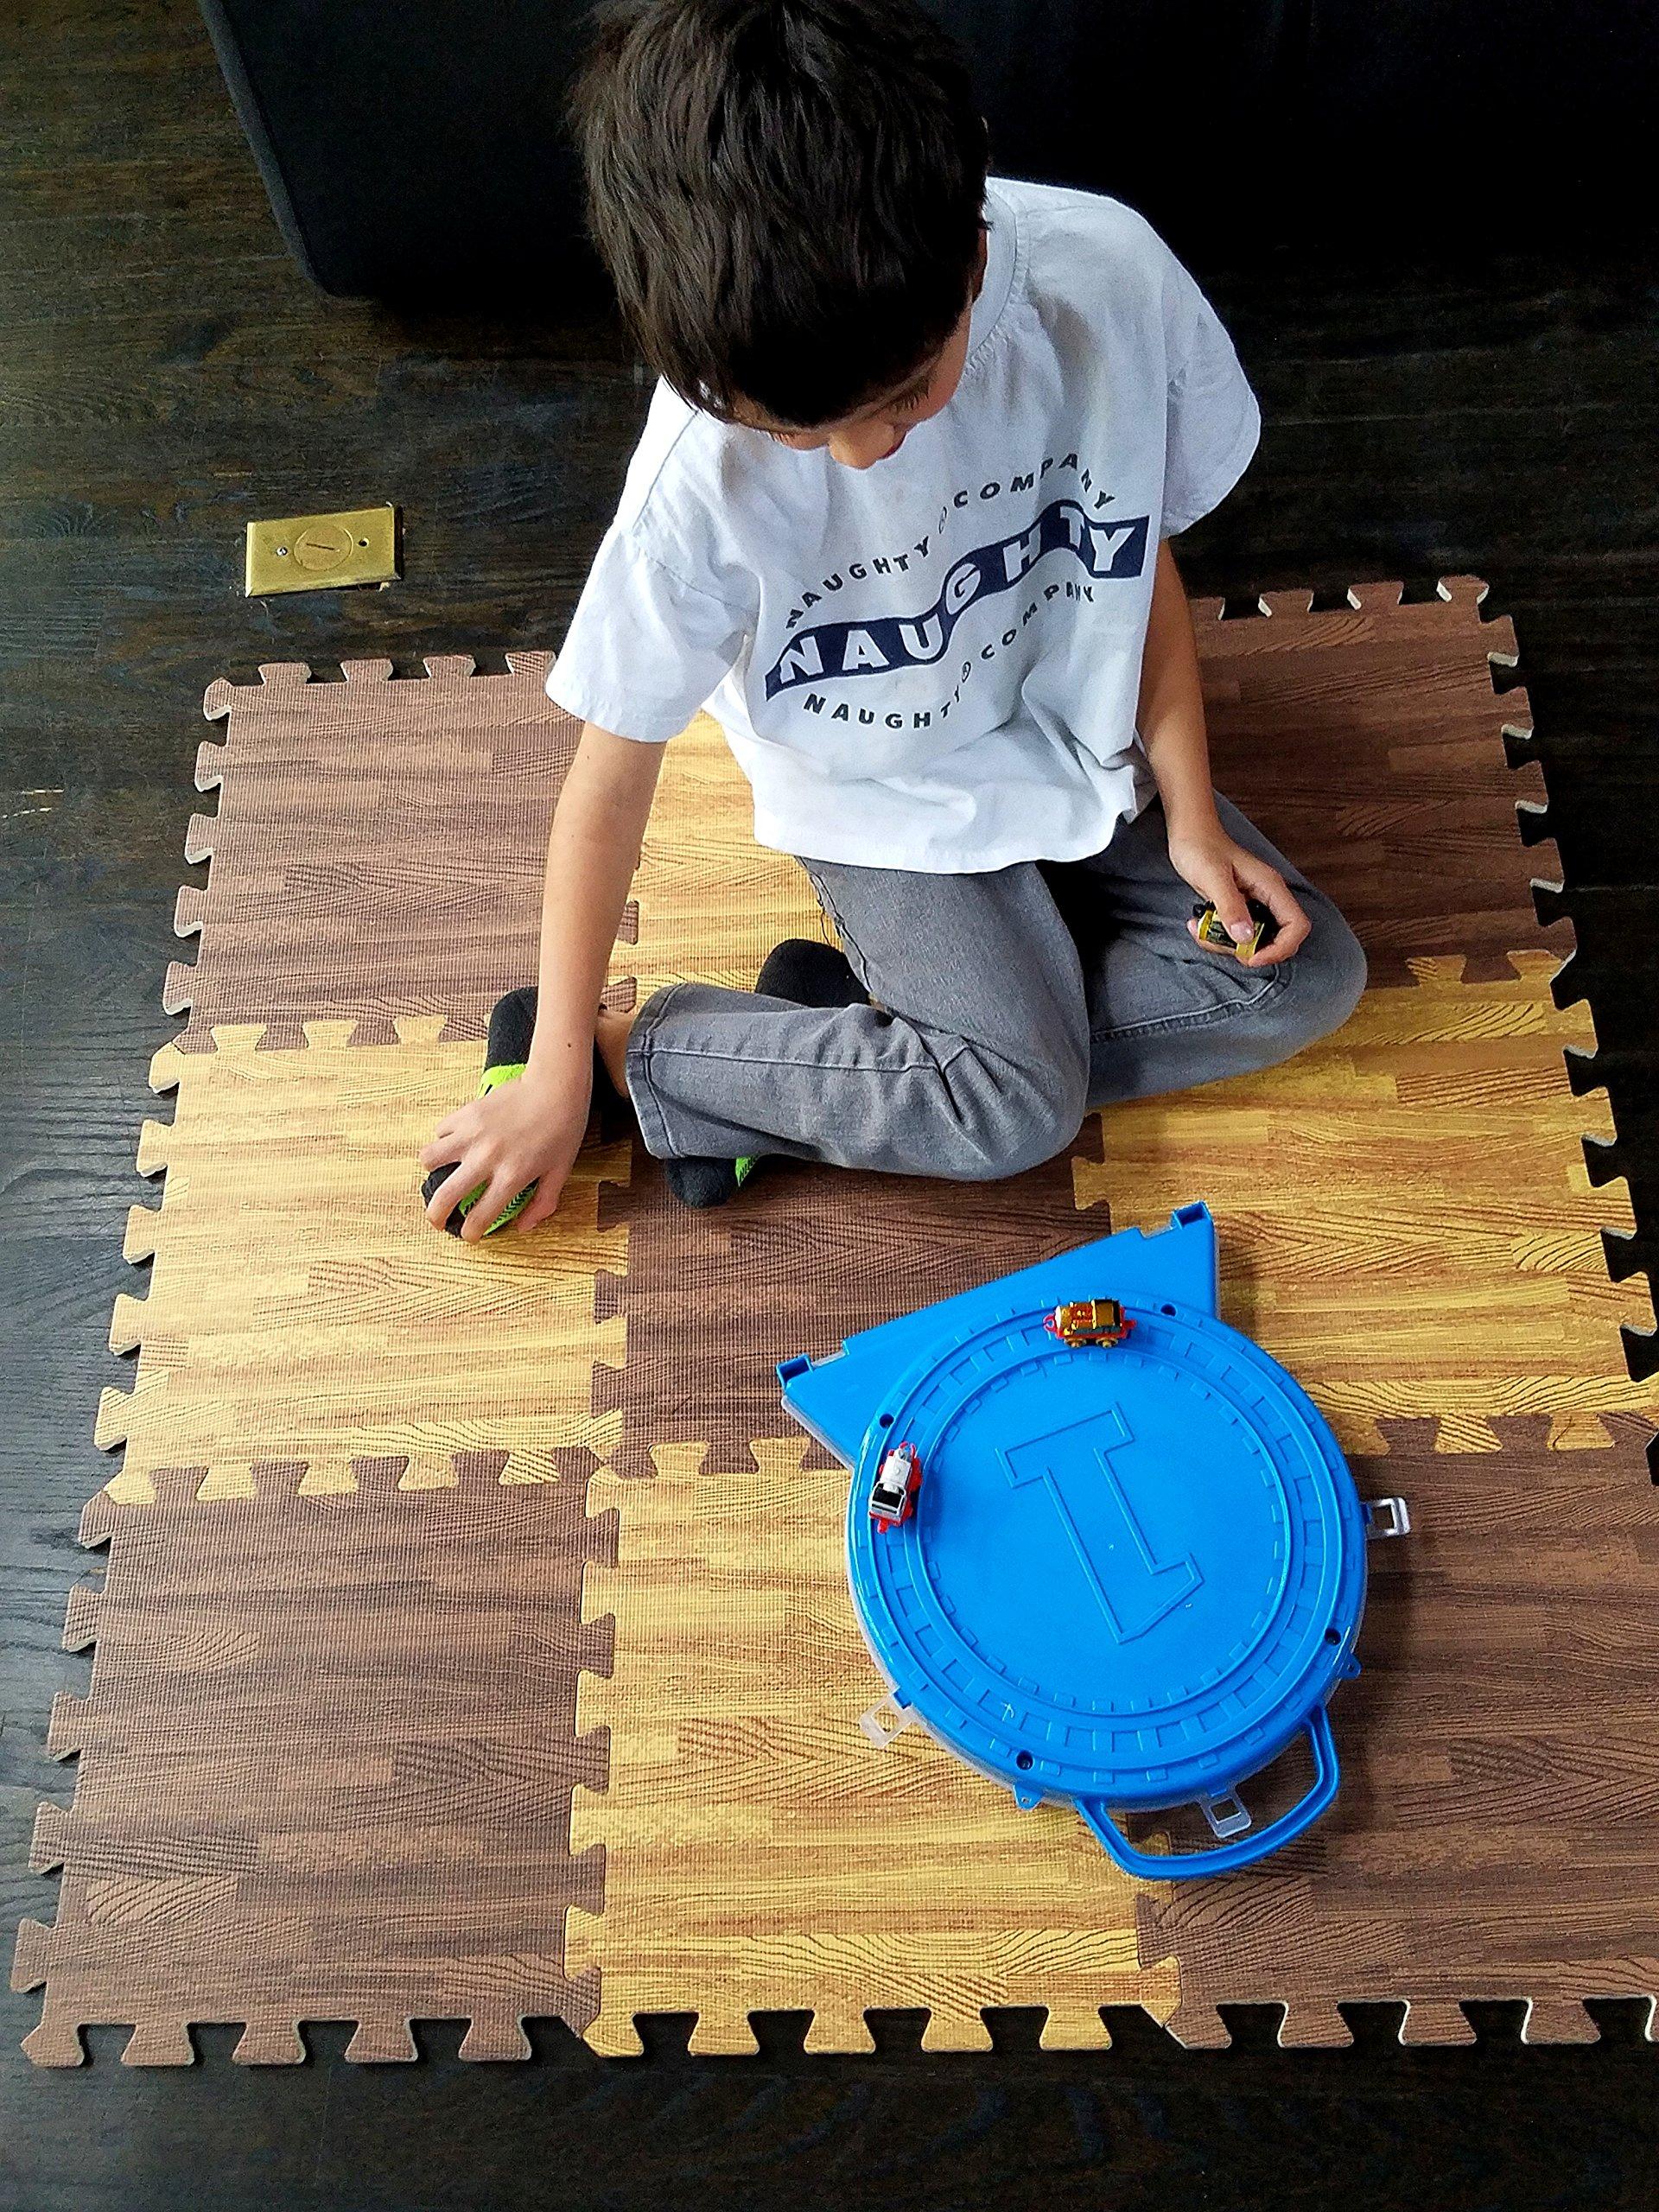 Interlocking Foam EVA Wood Grain Flooring Sets by Homeneeds (9 Piece - Dark Brown, Light Brown Wood Grain)